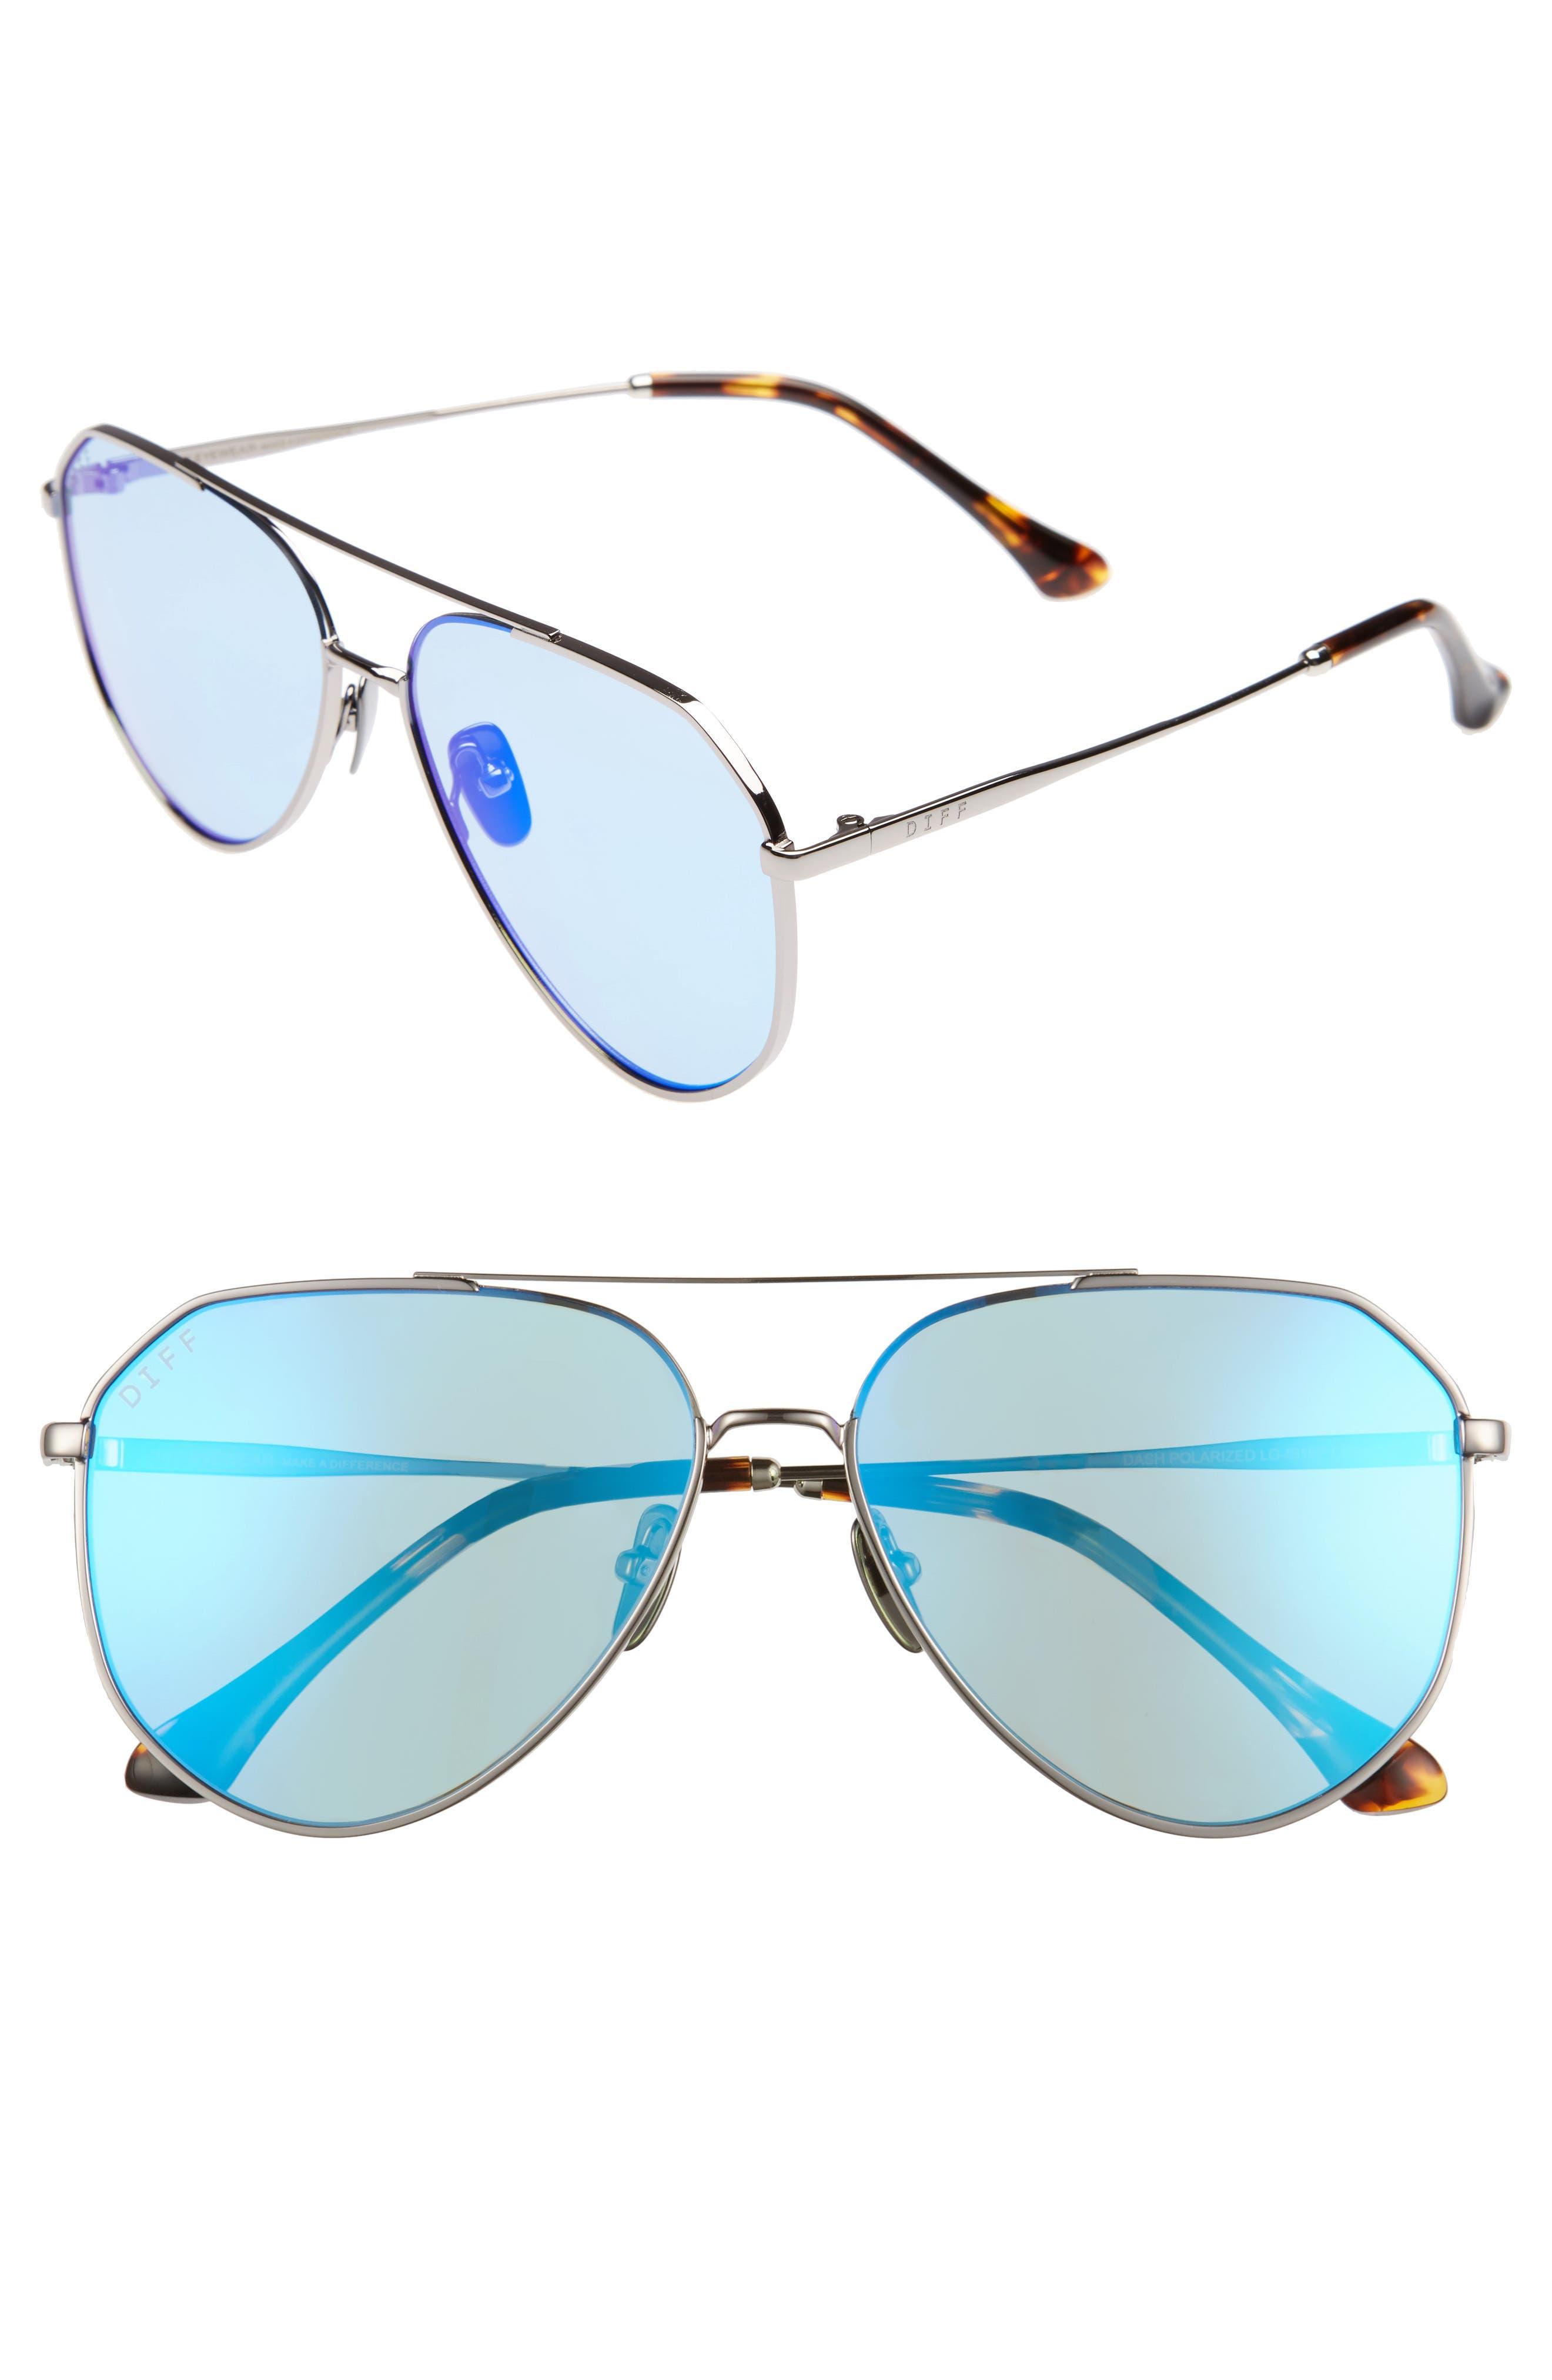 Main Image - DIFF Dash 61mm Polarized Aviator Sunglasses